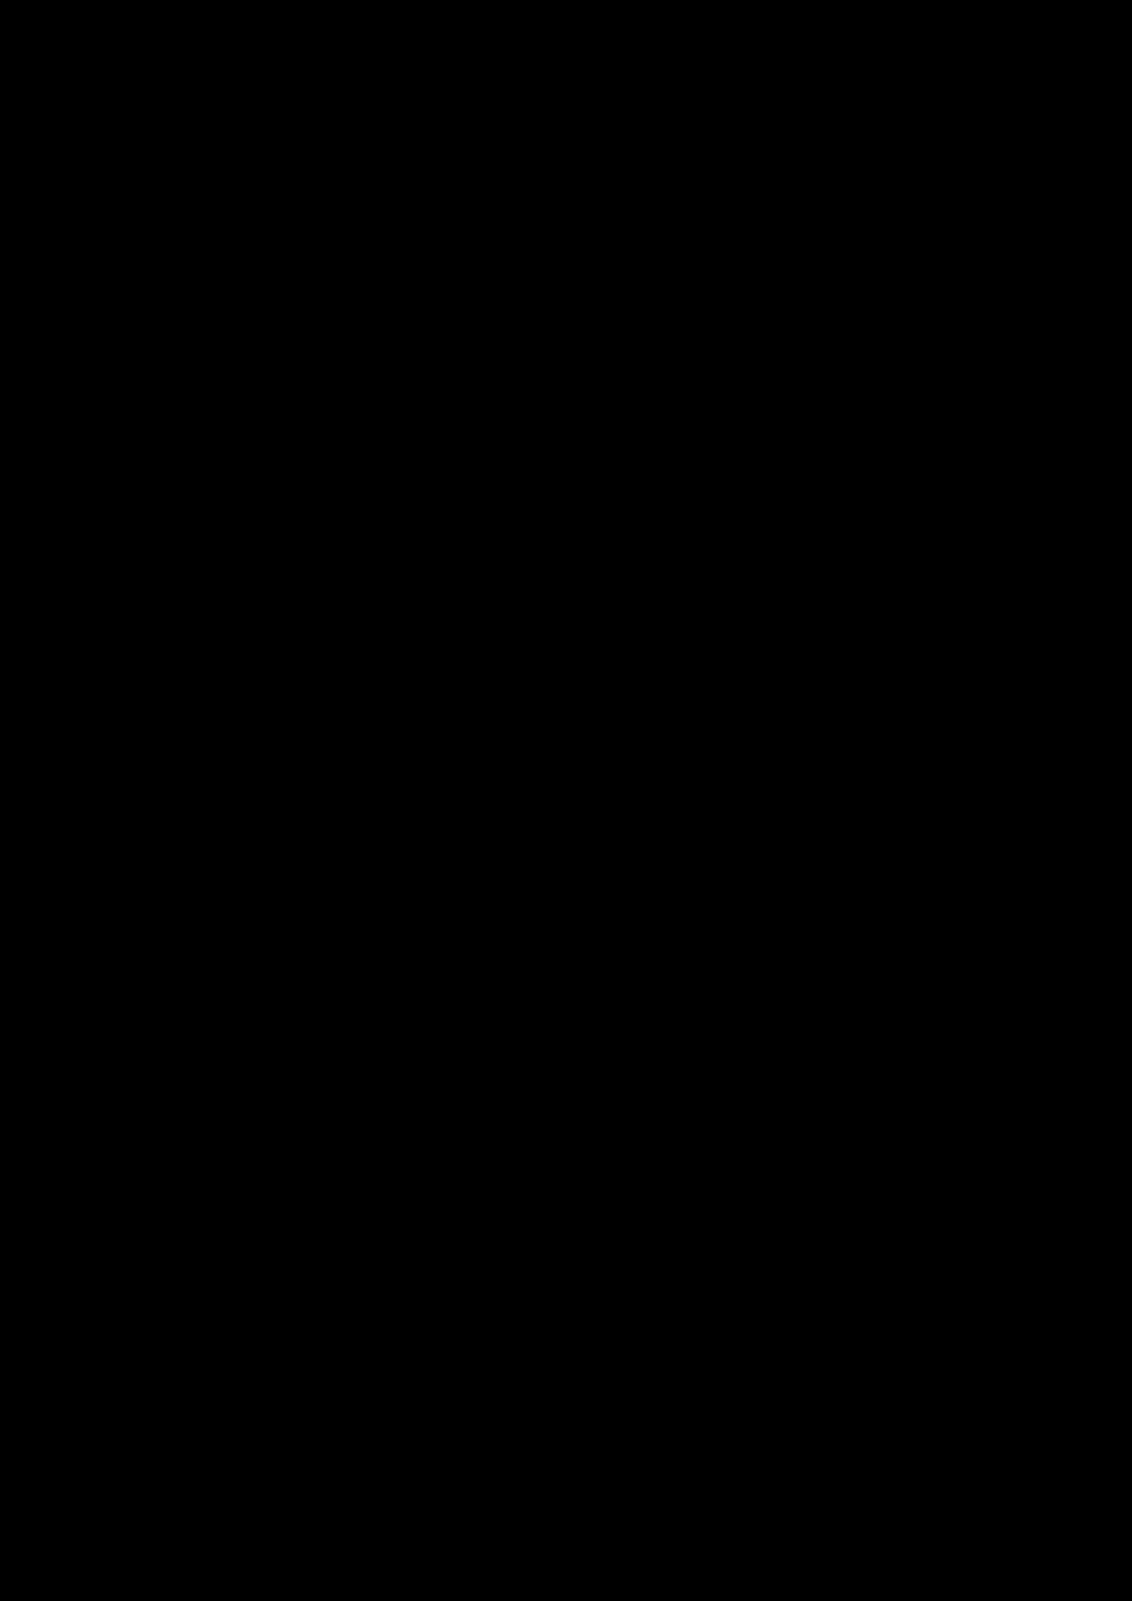 Ispoved Pervogo Boga slide, Image 22